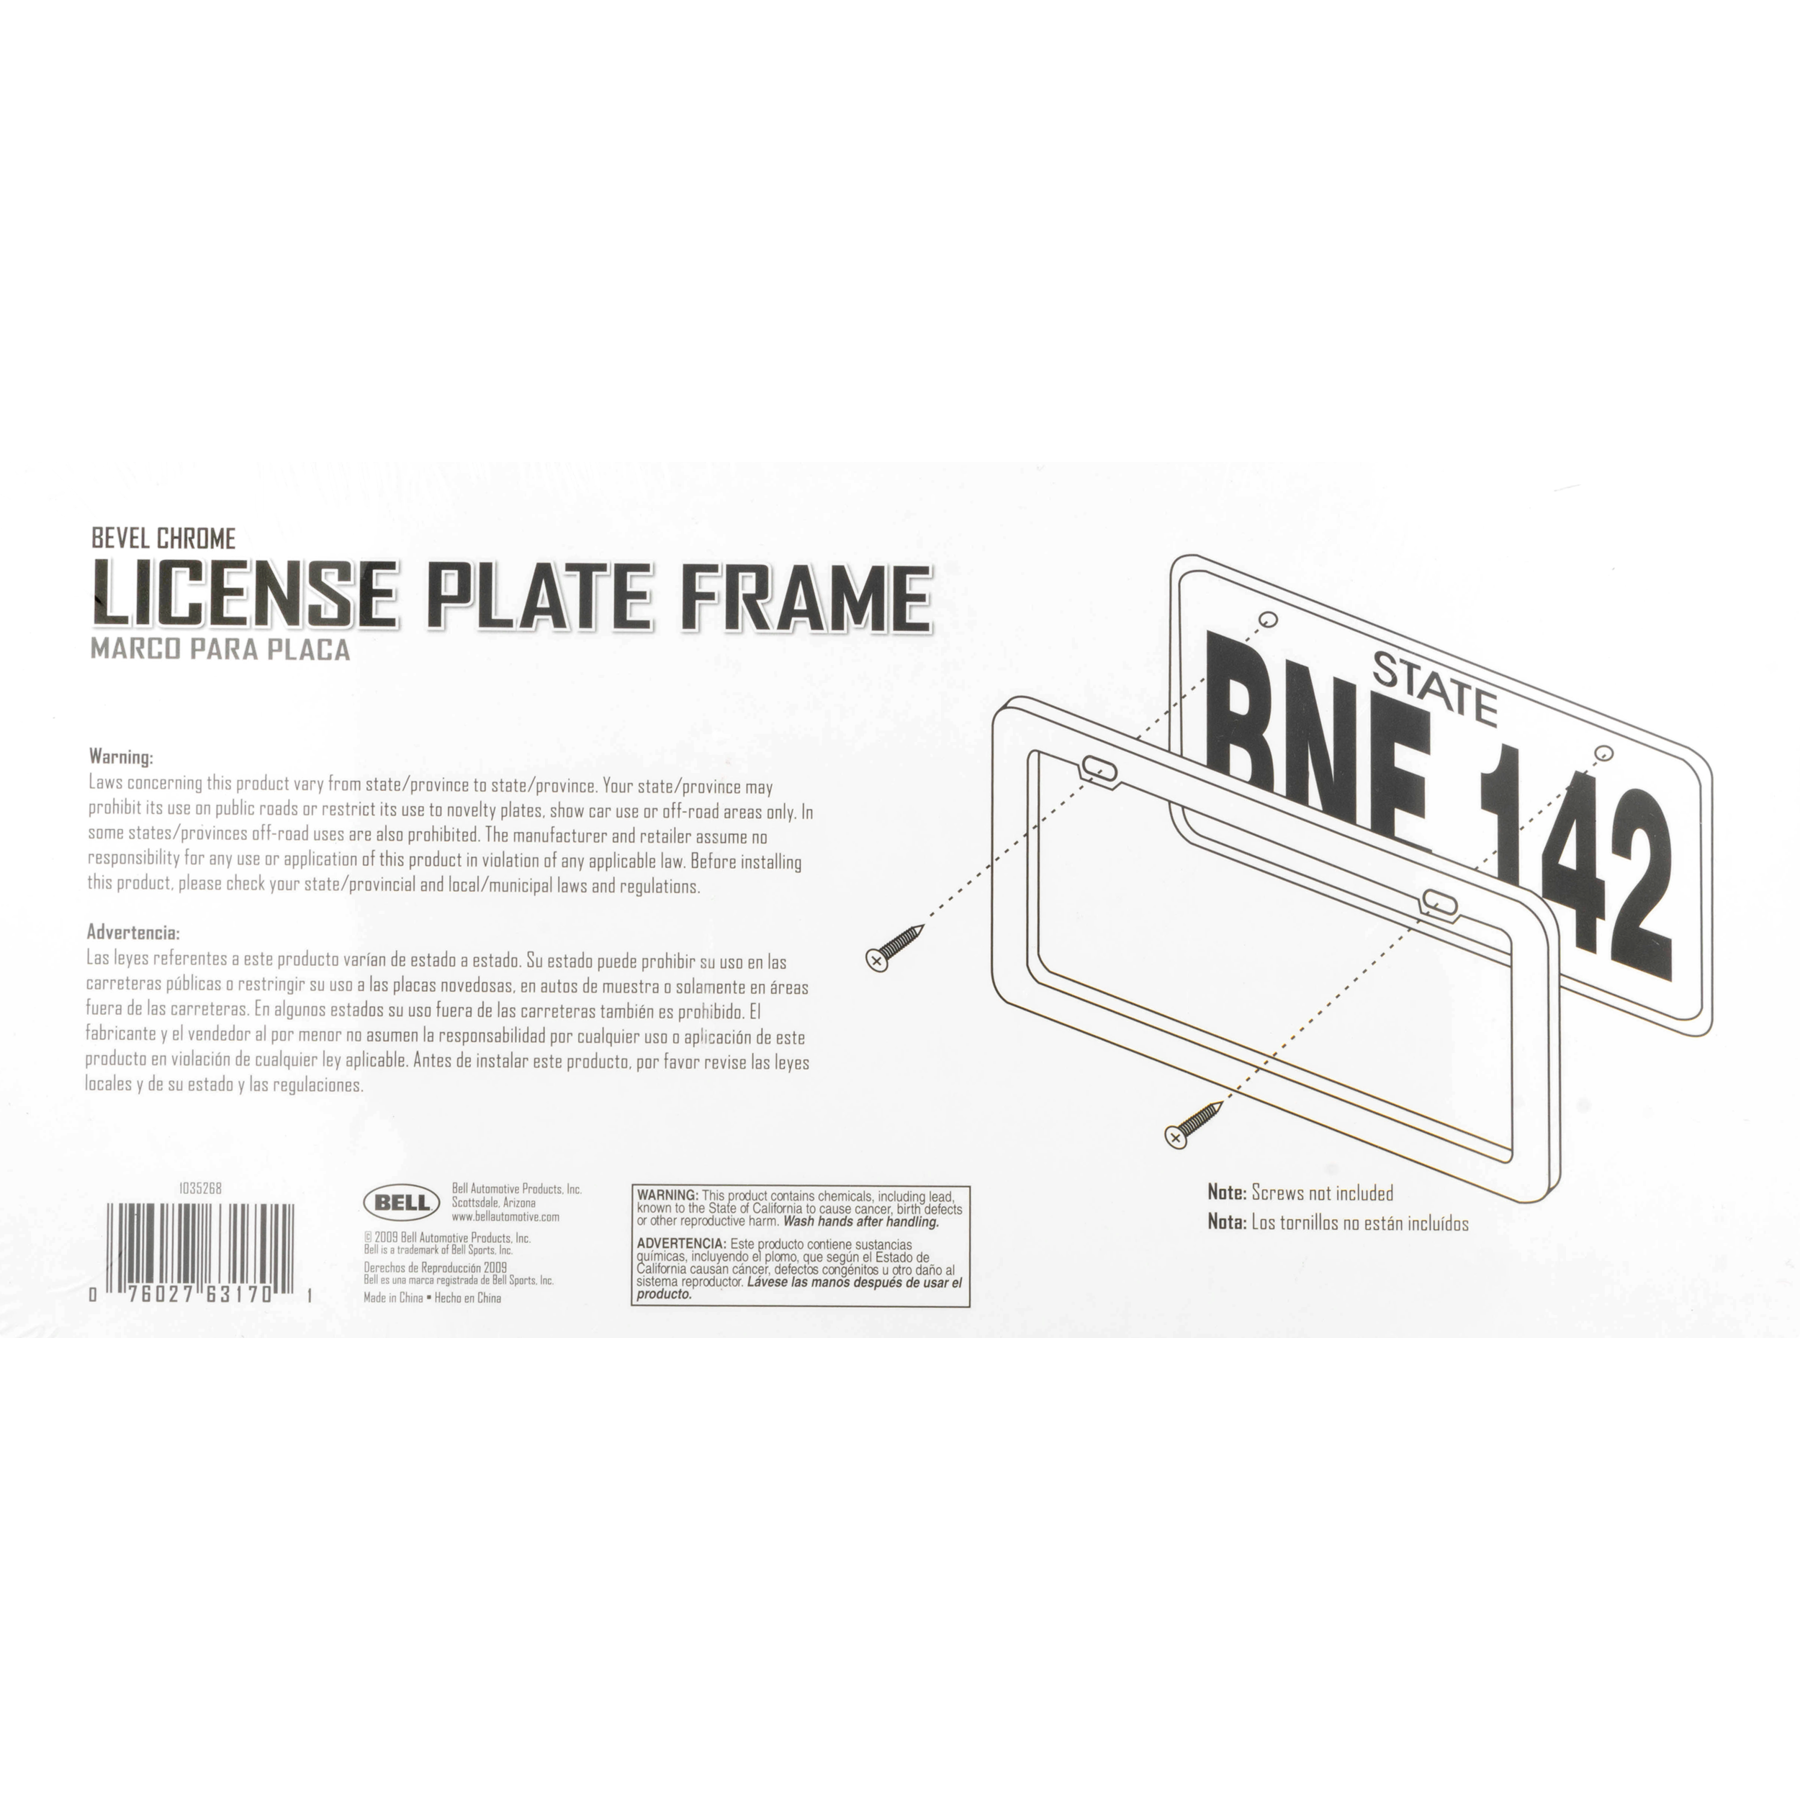 Bell Bevel Chrome License Plate Frame, 1.0 CT - Walmart.com